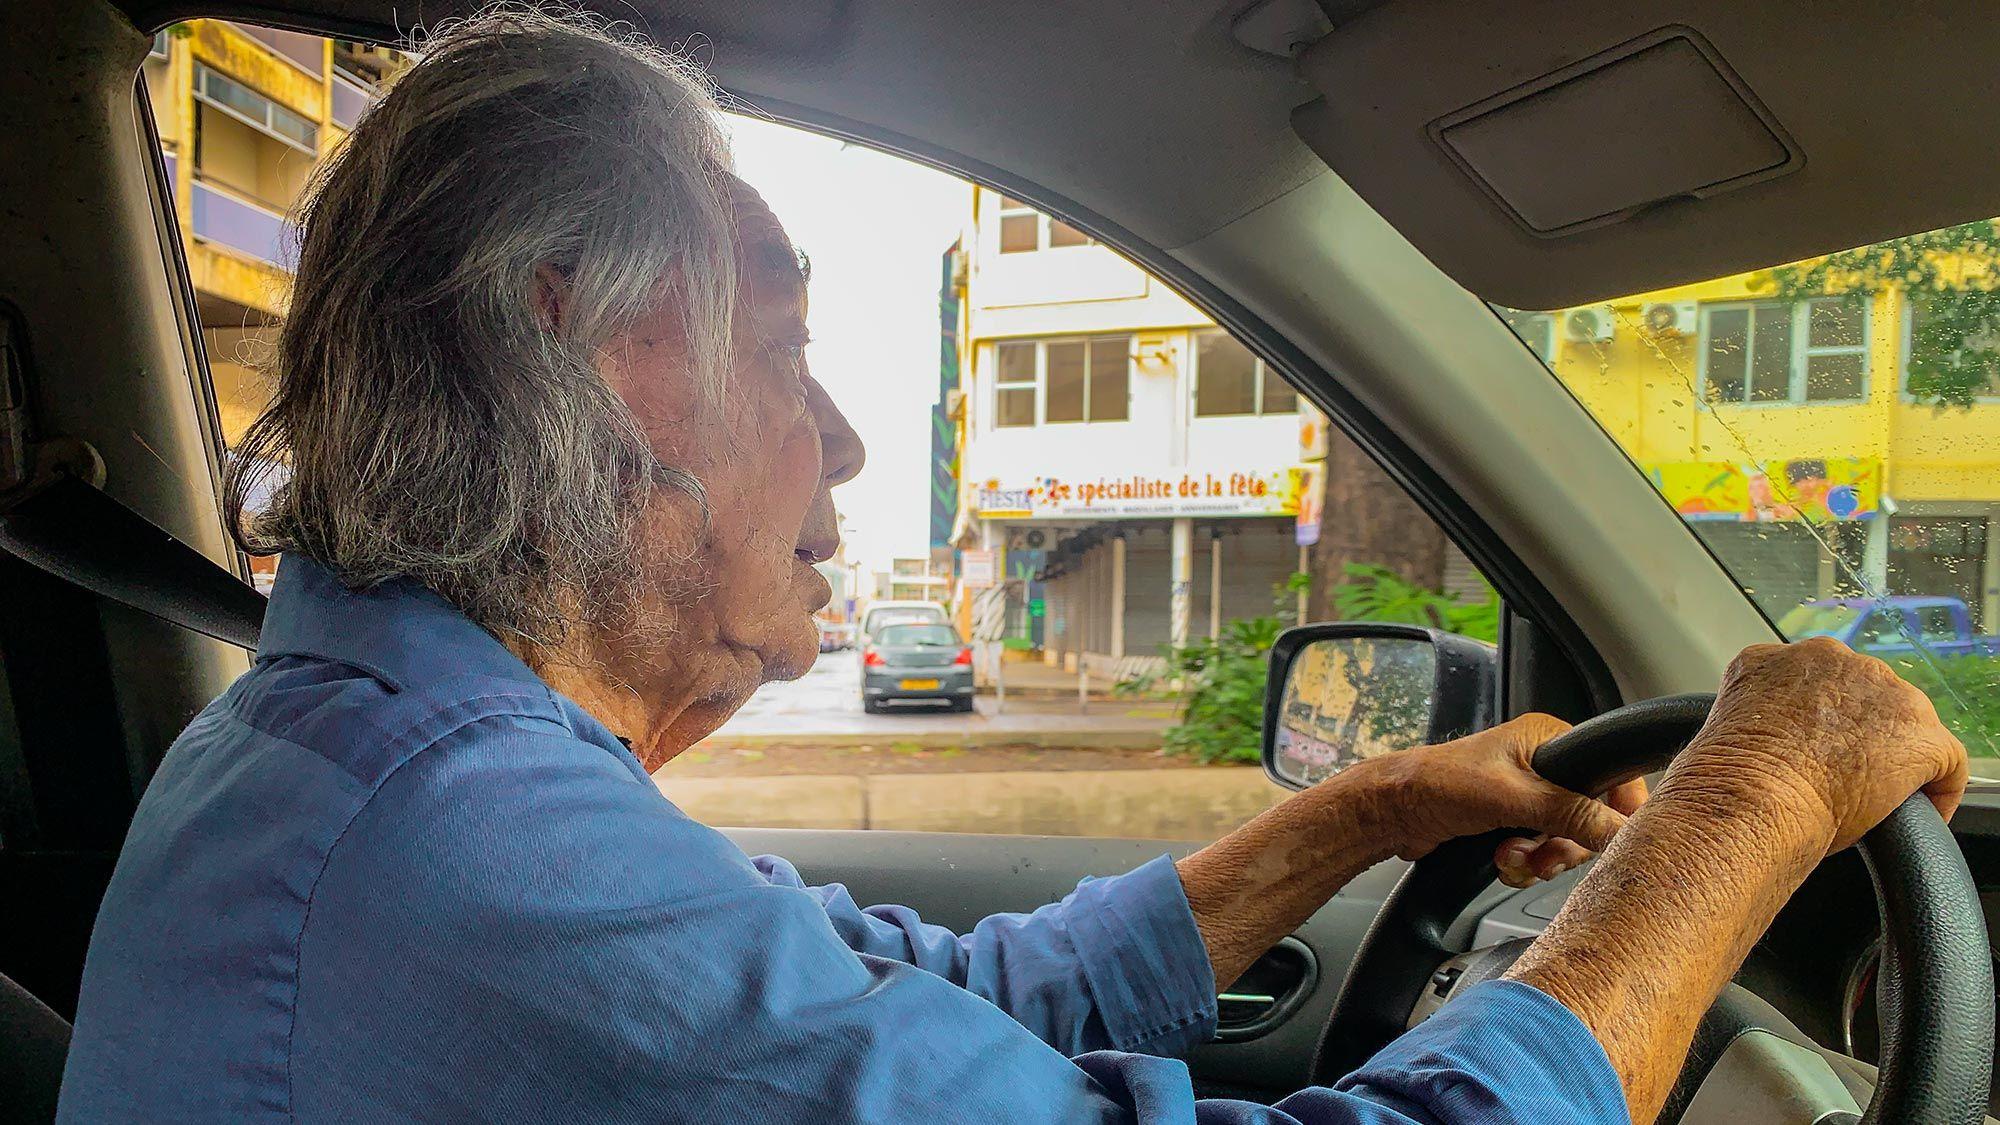 tahiti taxi driver